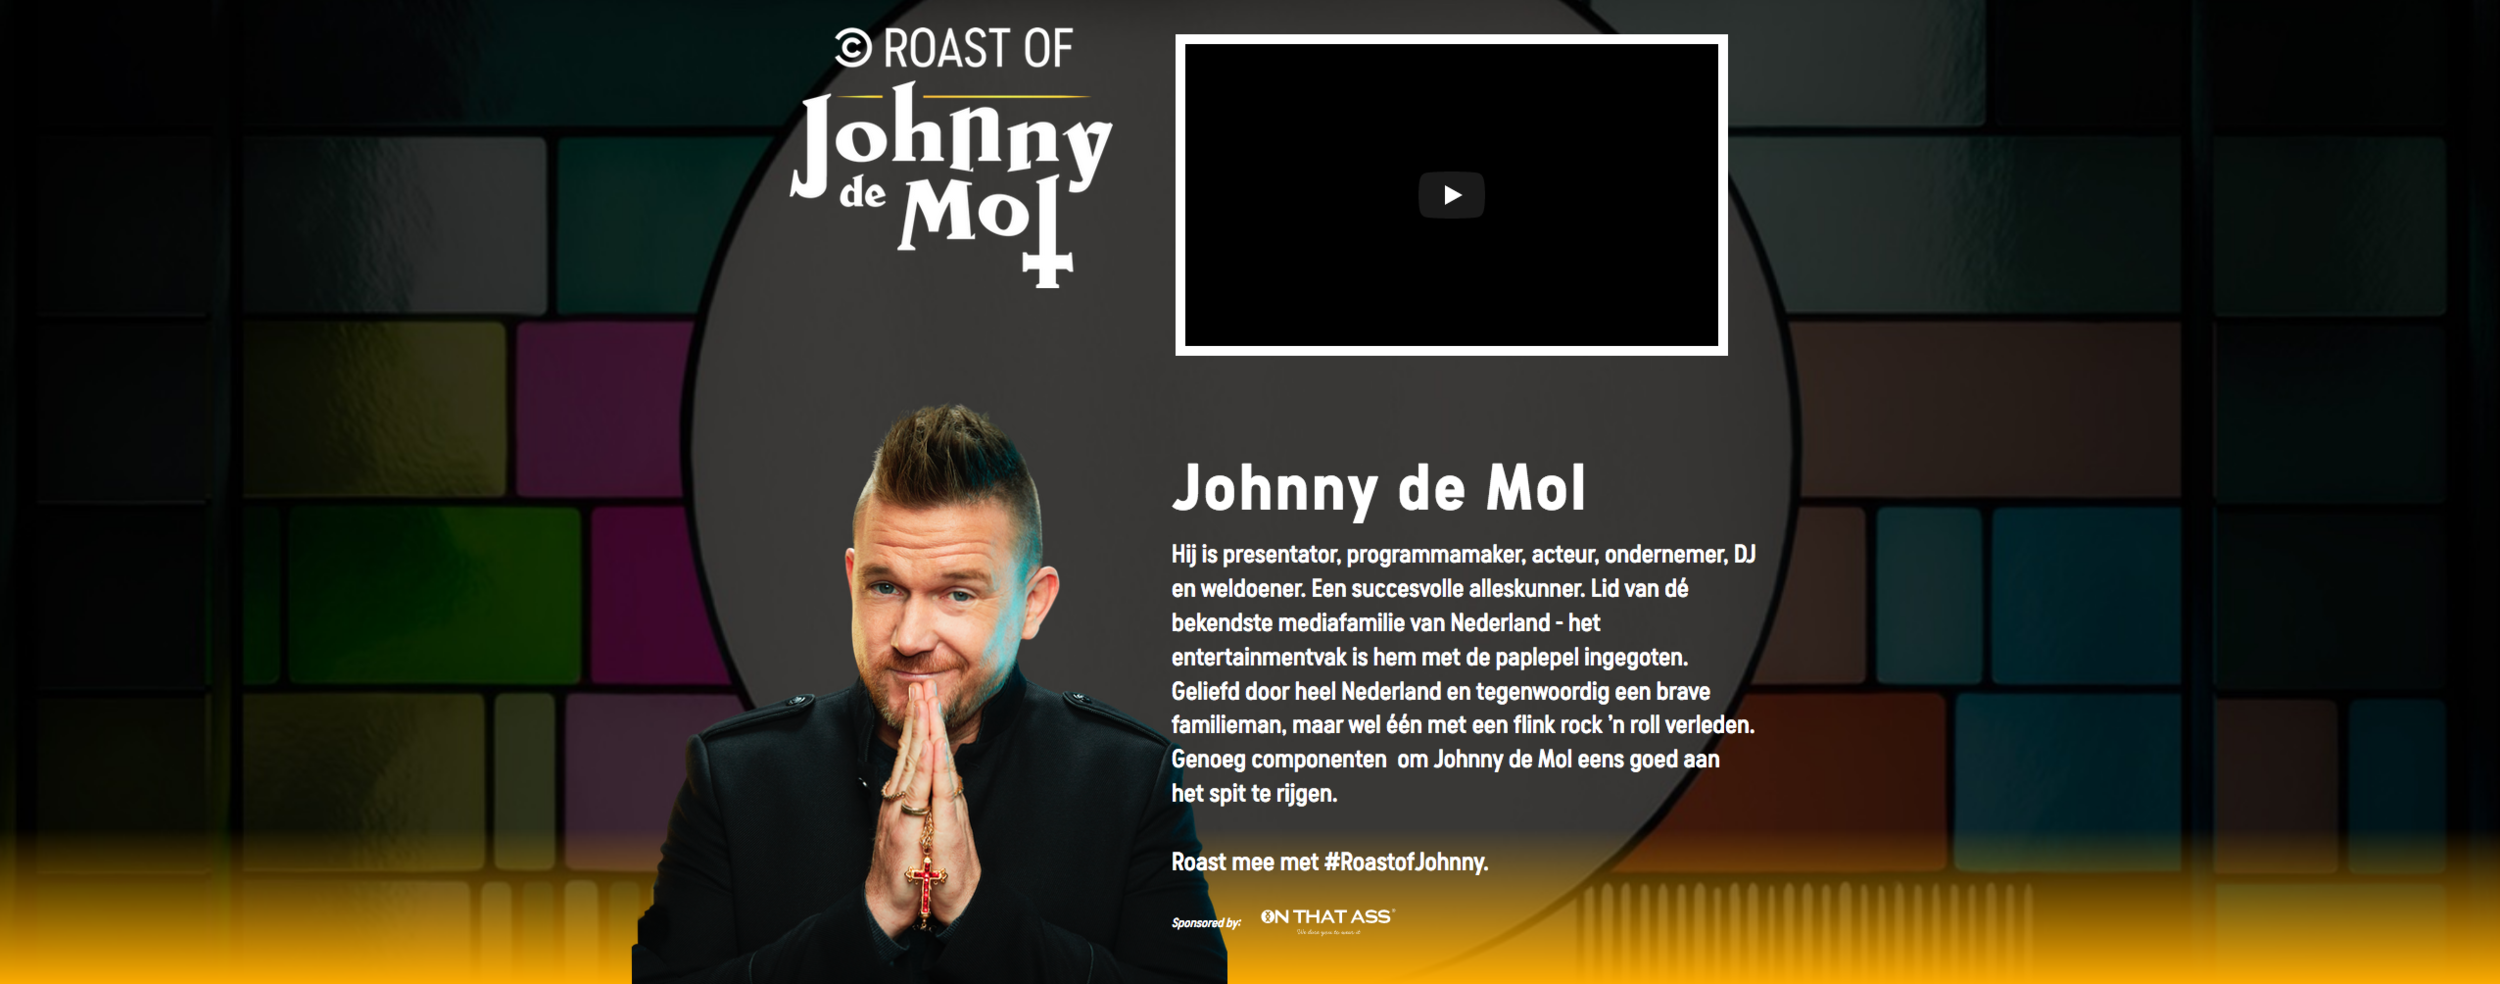 Johnny_Mol_Roasts_PimHendriksen.png